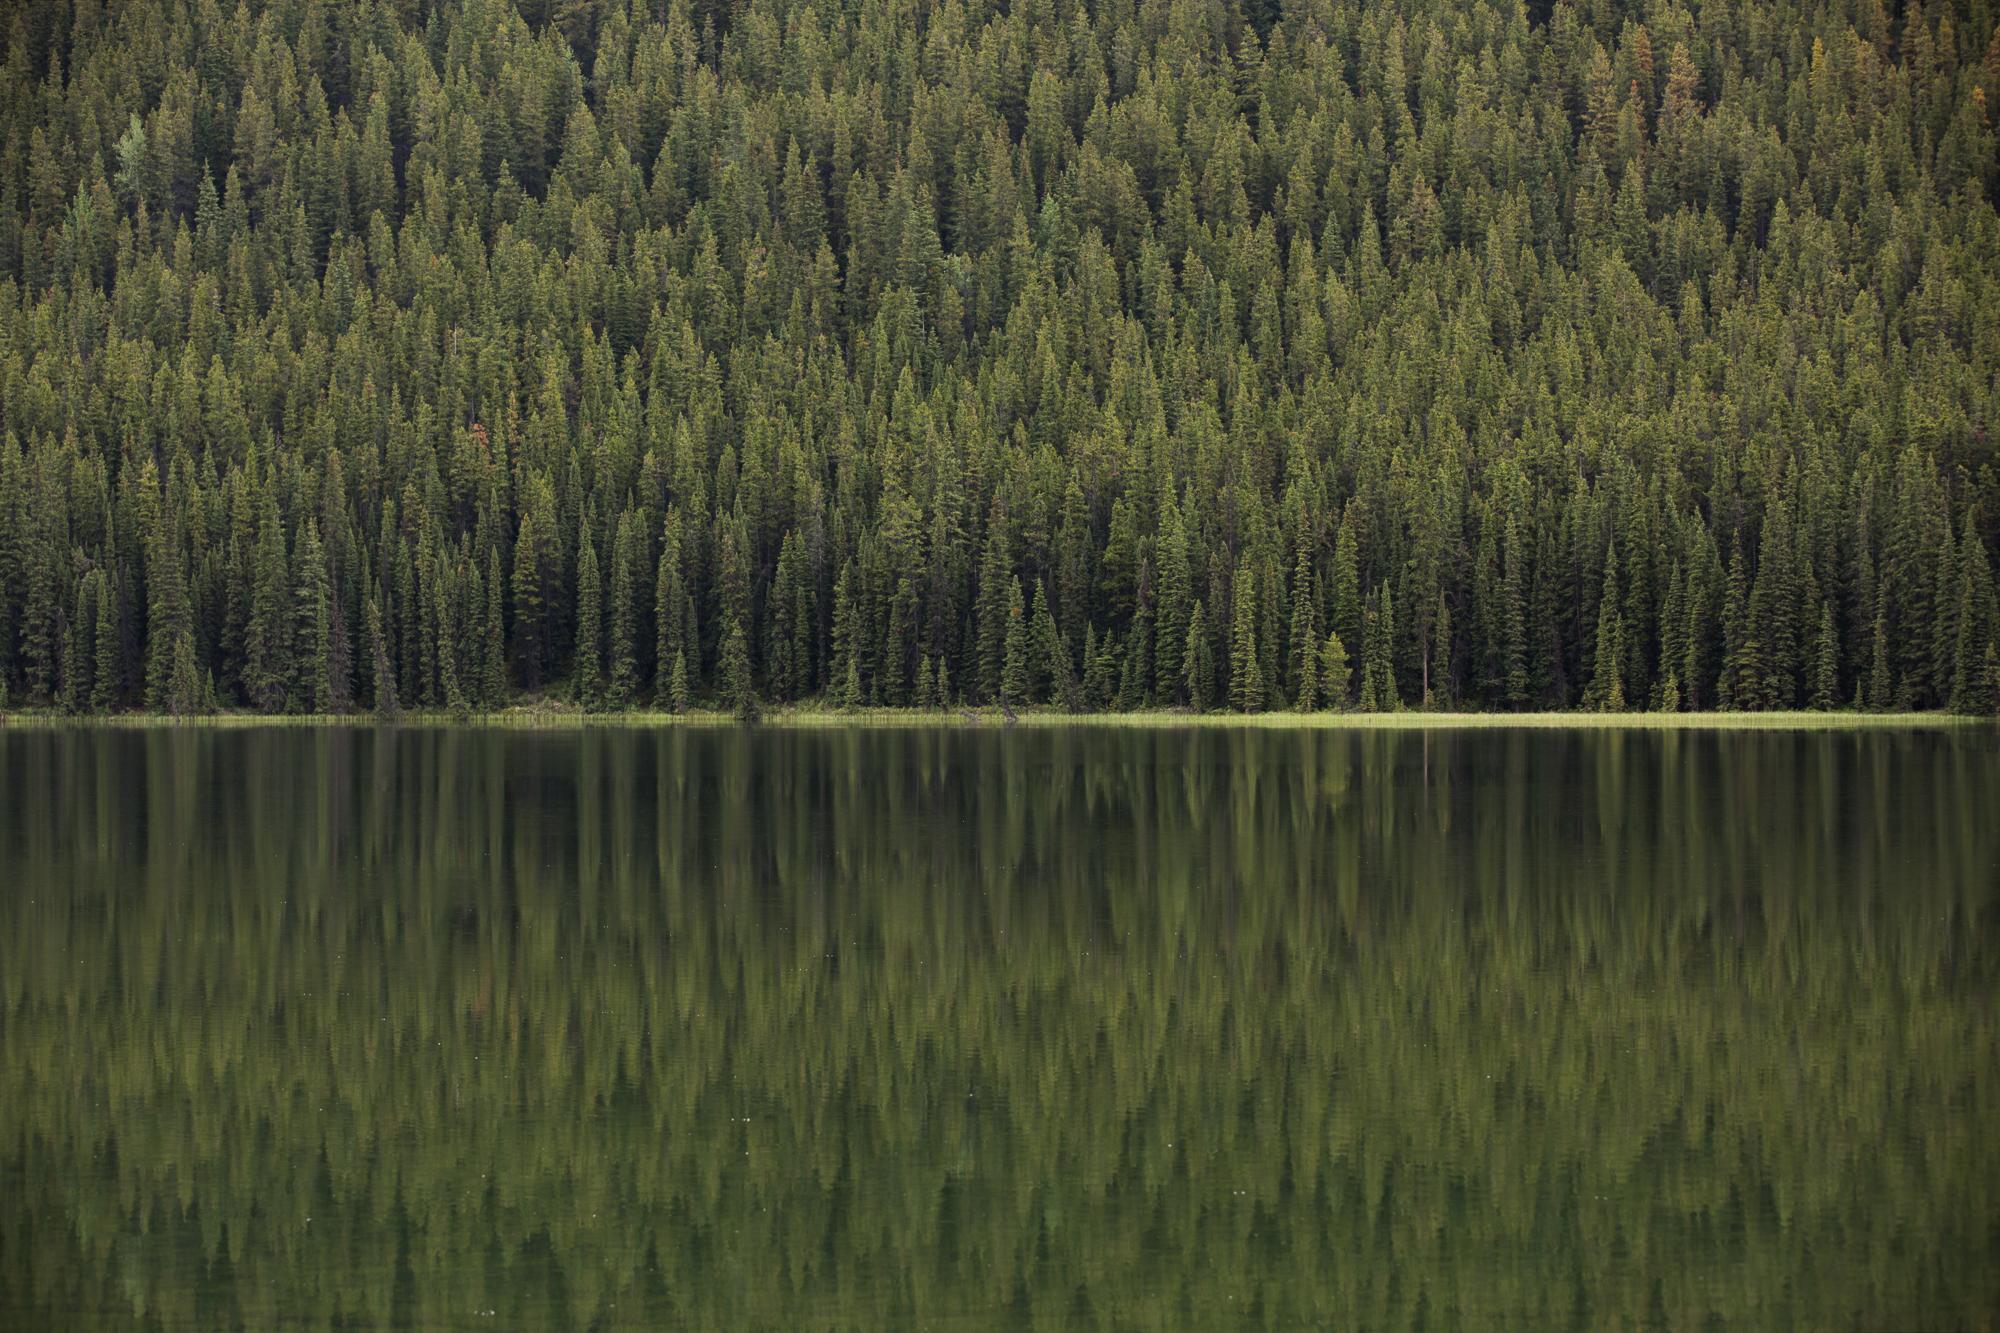 16-Bec_Kilpatrick_Photography_CanadaBEC_222922